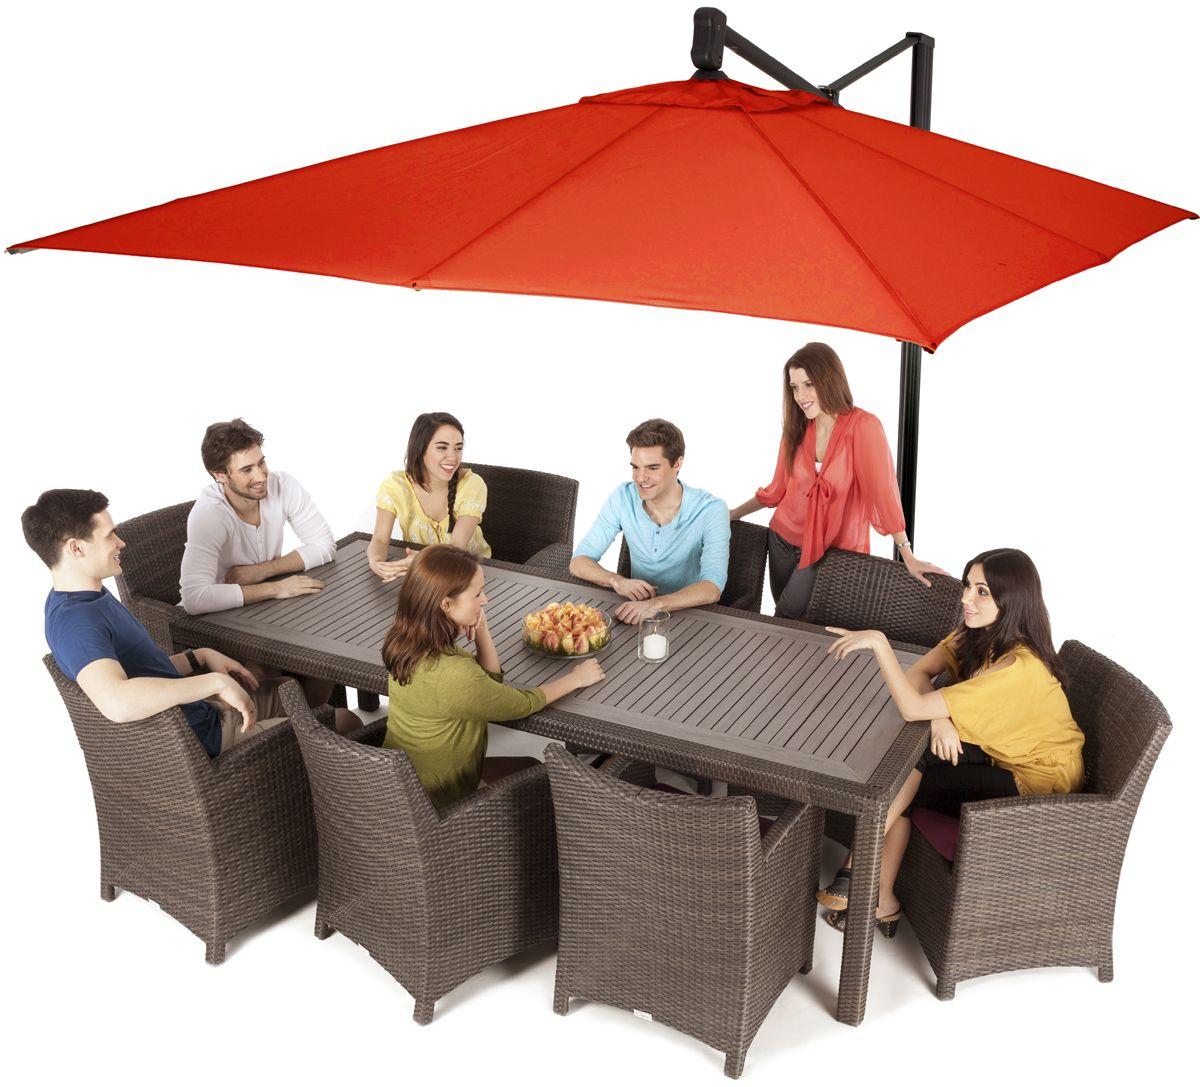 meubles de jardin ogni et parasols de patio meubles de patio rh pinterest com Outdoor Patio Furniture Sale Discontinued Patio Furniture